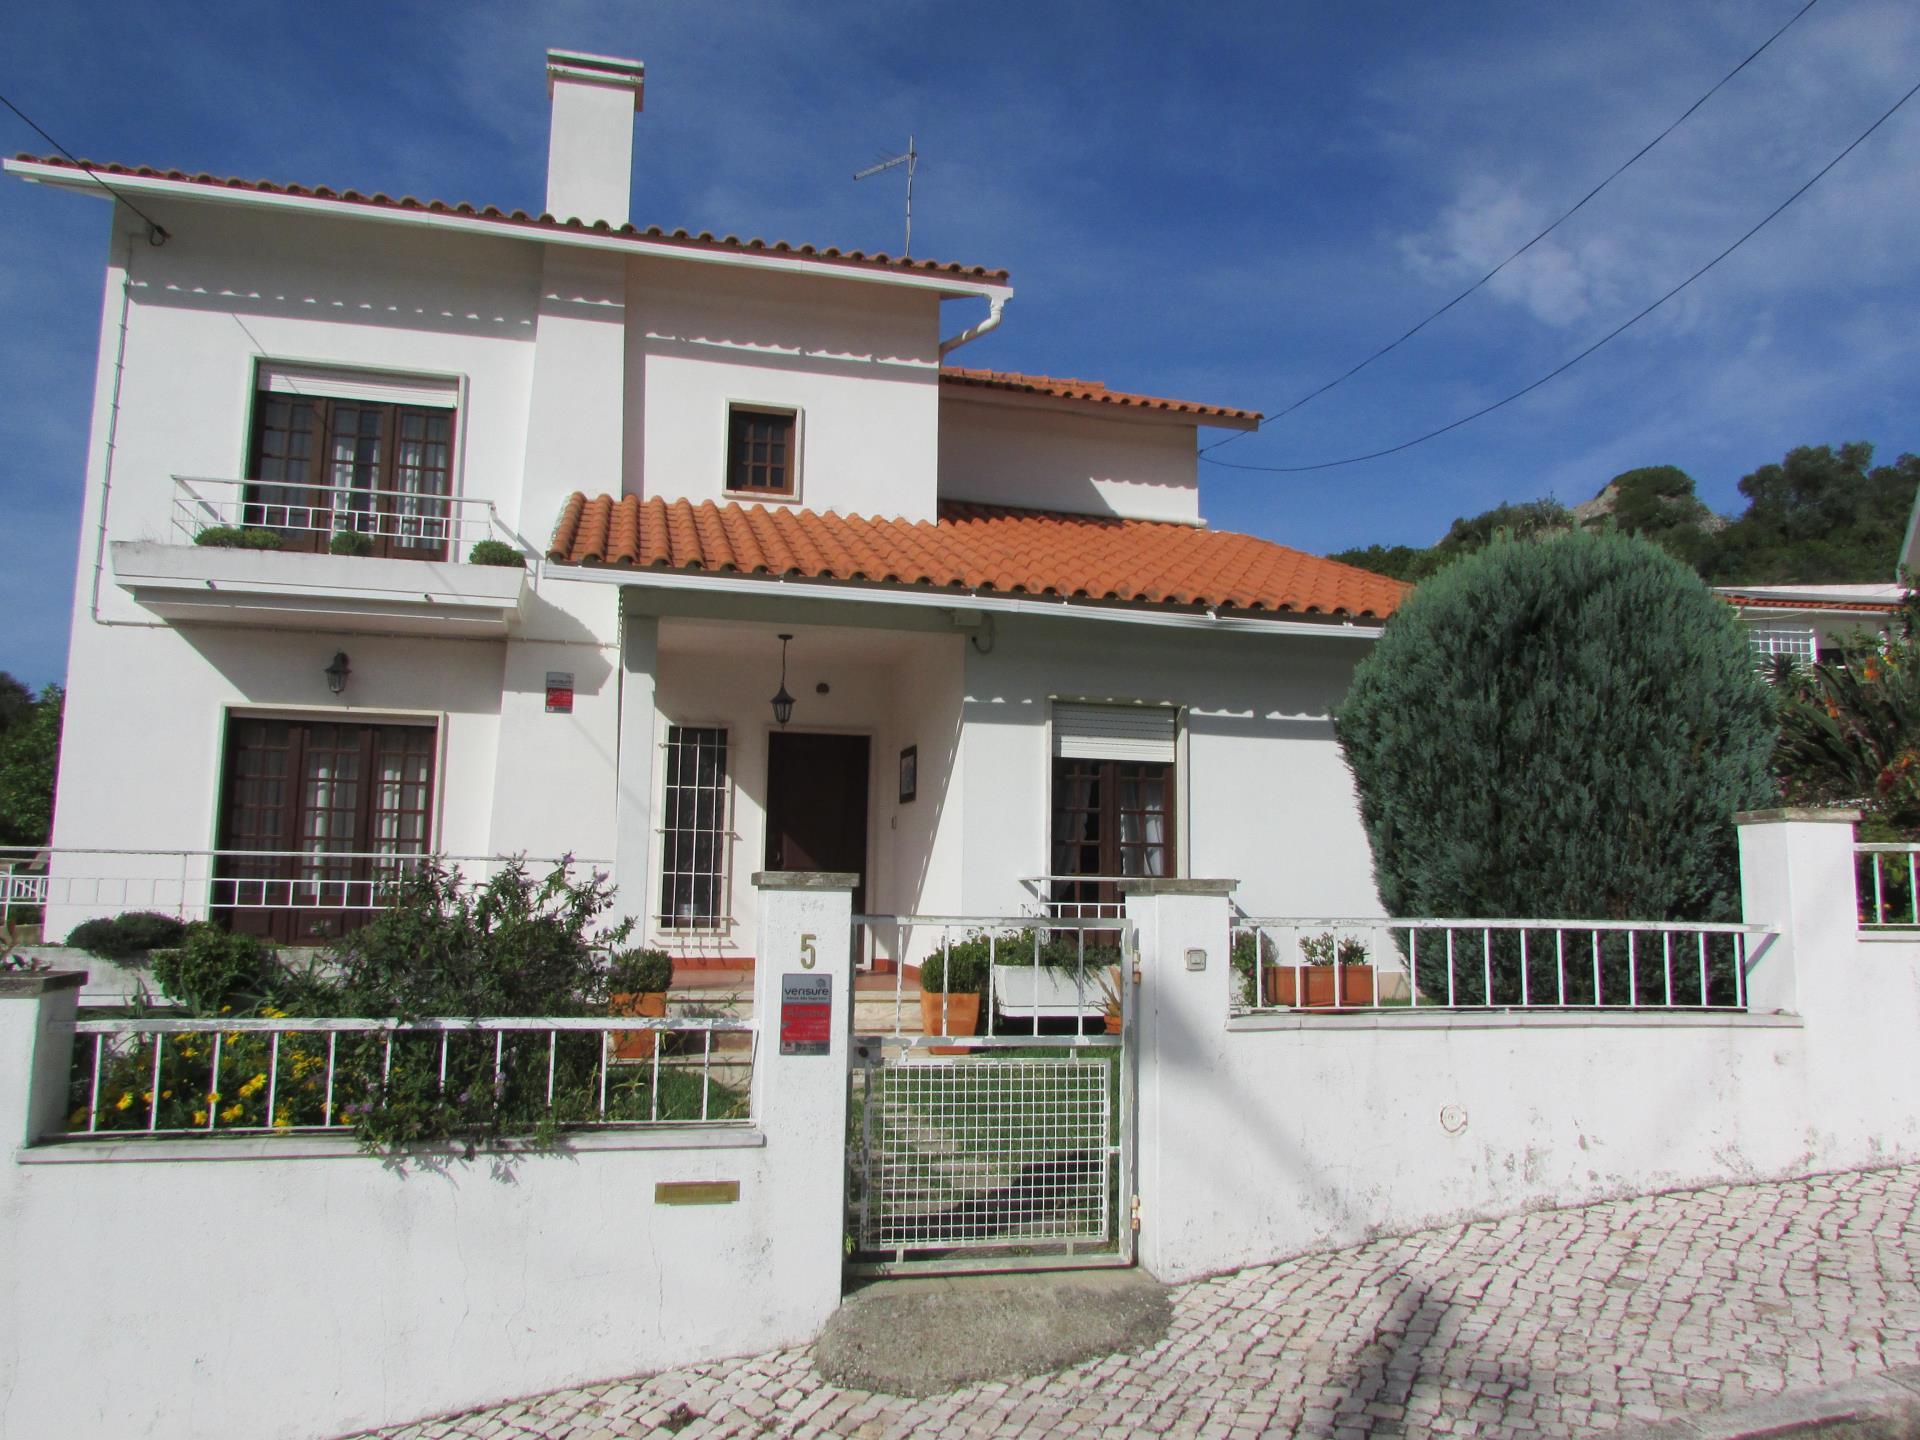 Moradia para Venda às Detached house, 5 bedrooms, for Sale Sintra, Lisboa Portugal